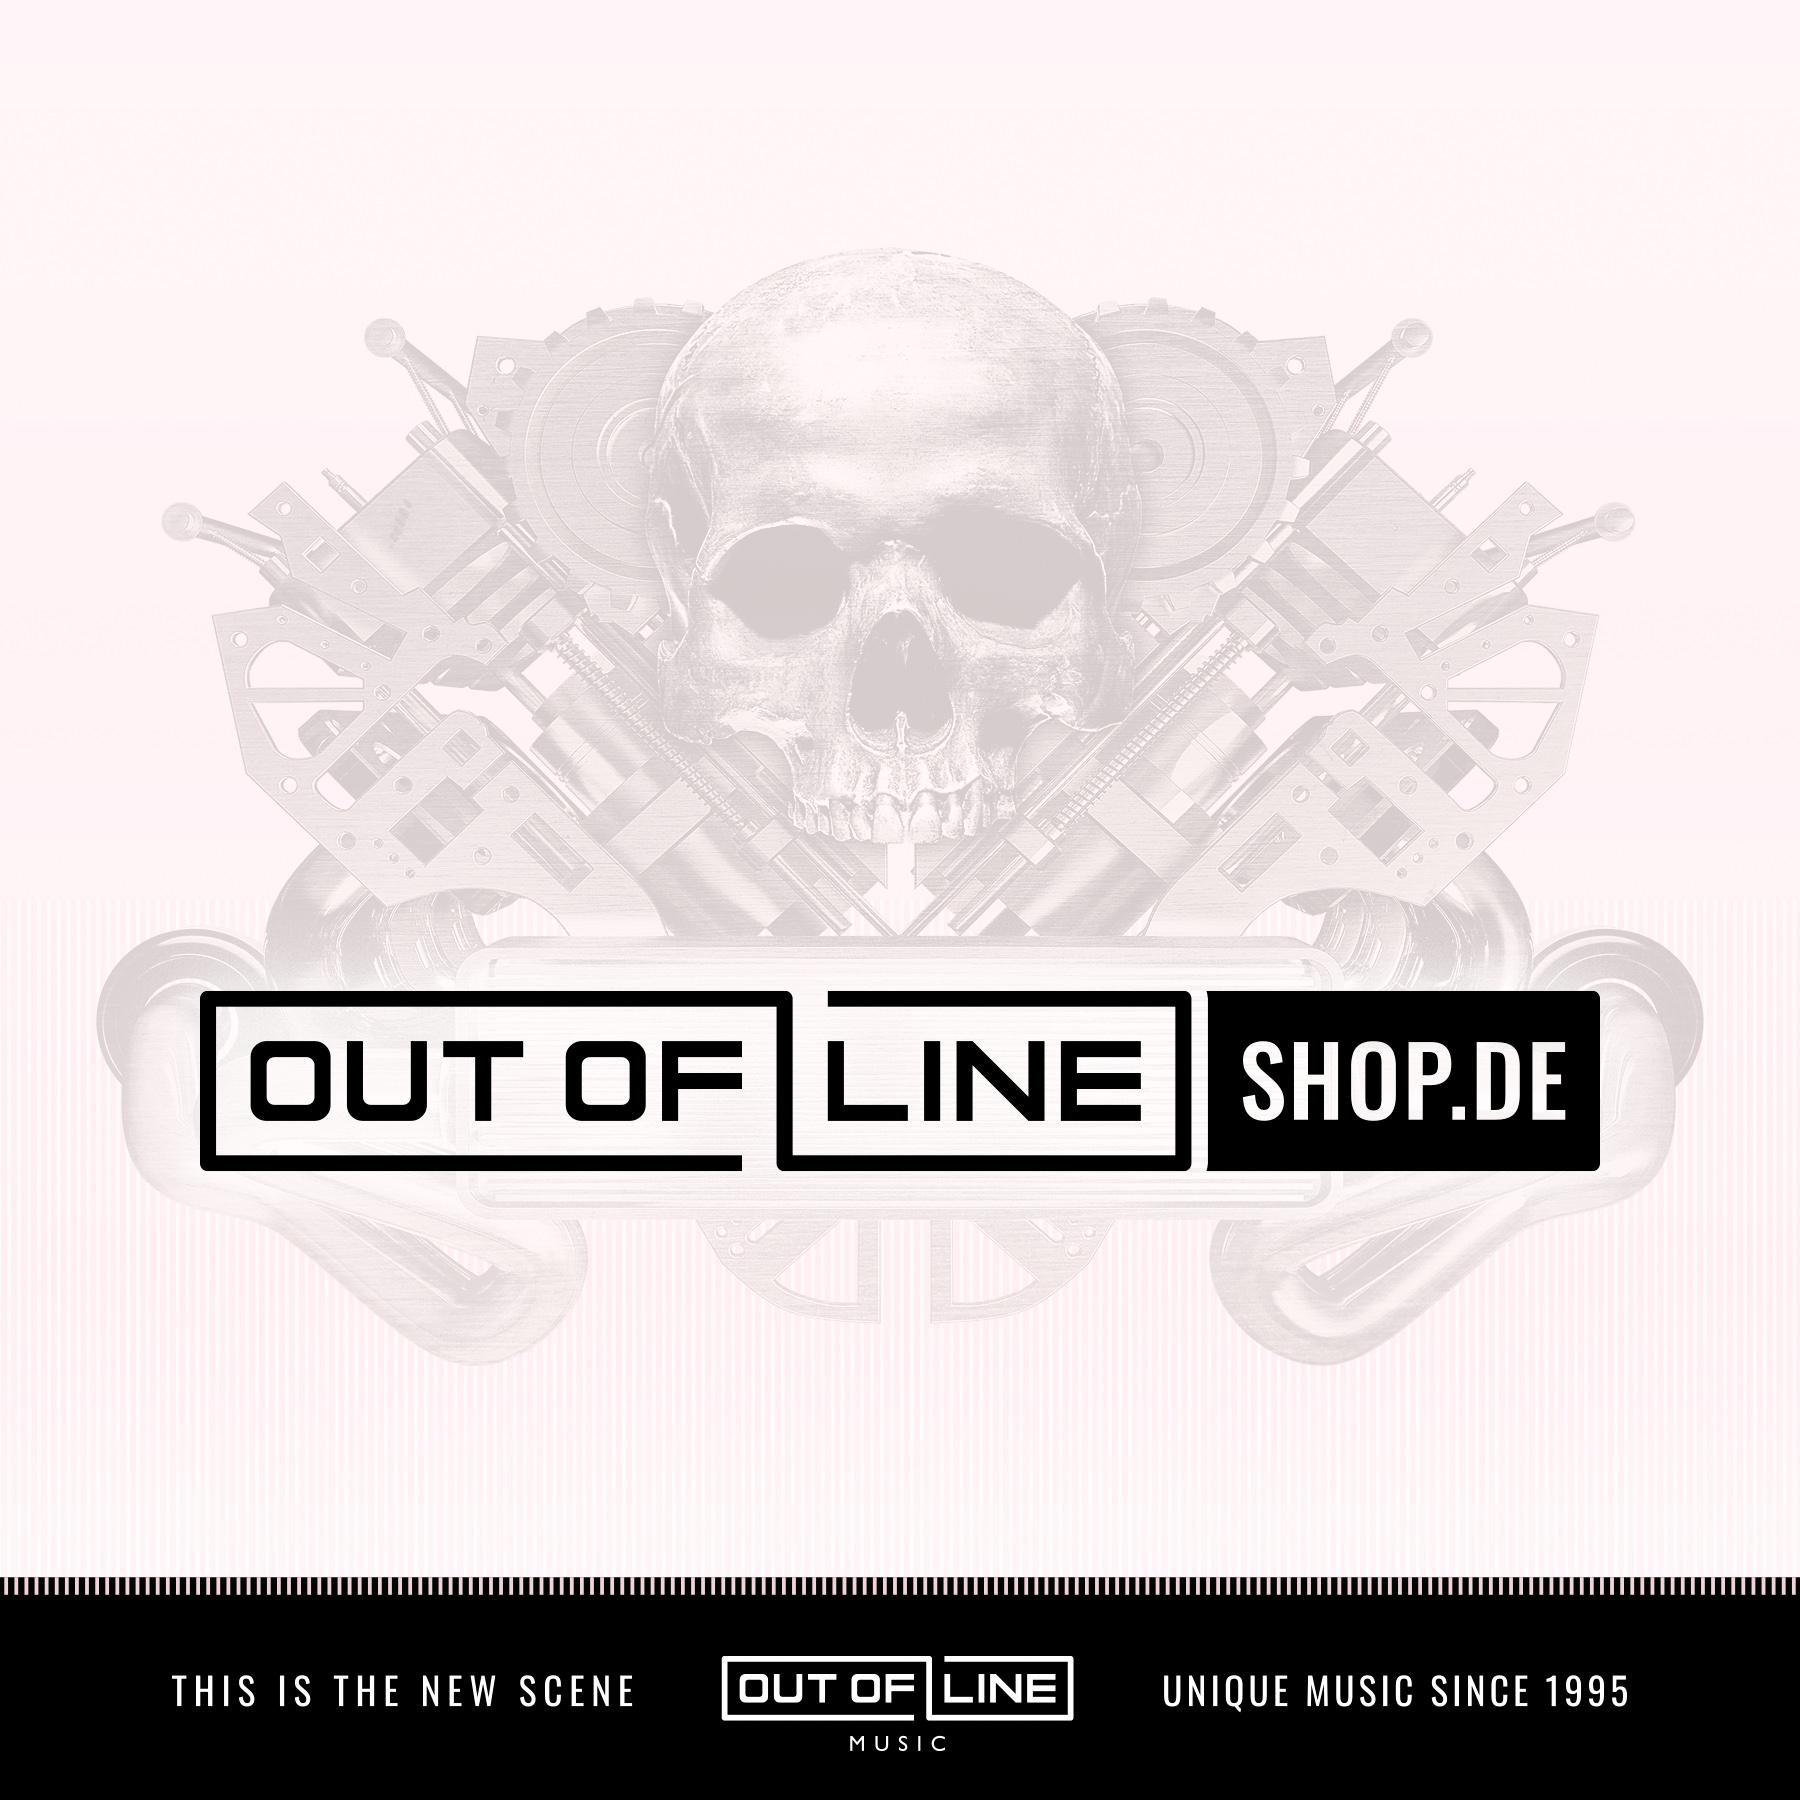 V.A. - Festival Tour Weapons 2013 - CD